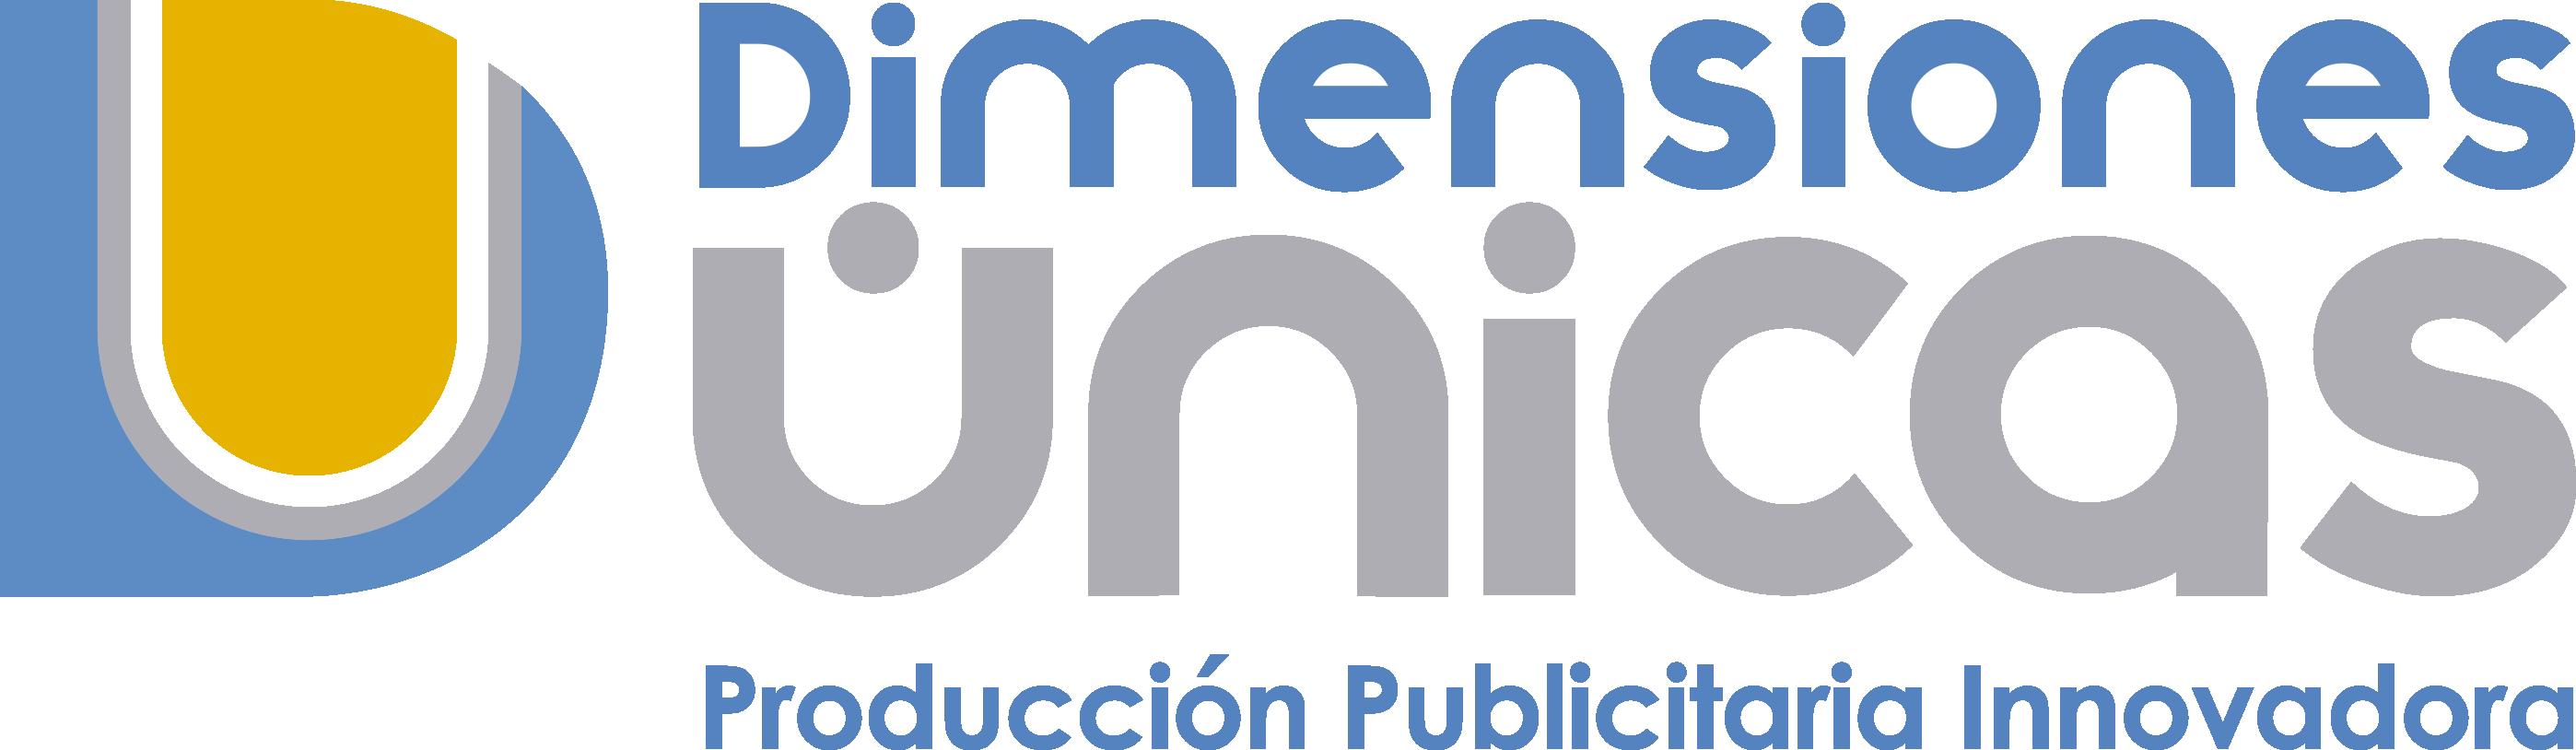 Logo-dimensiones-unicas